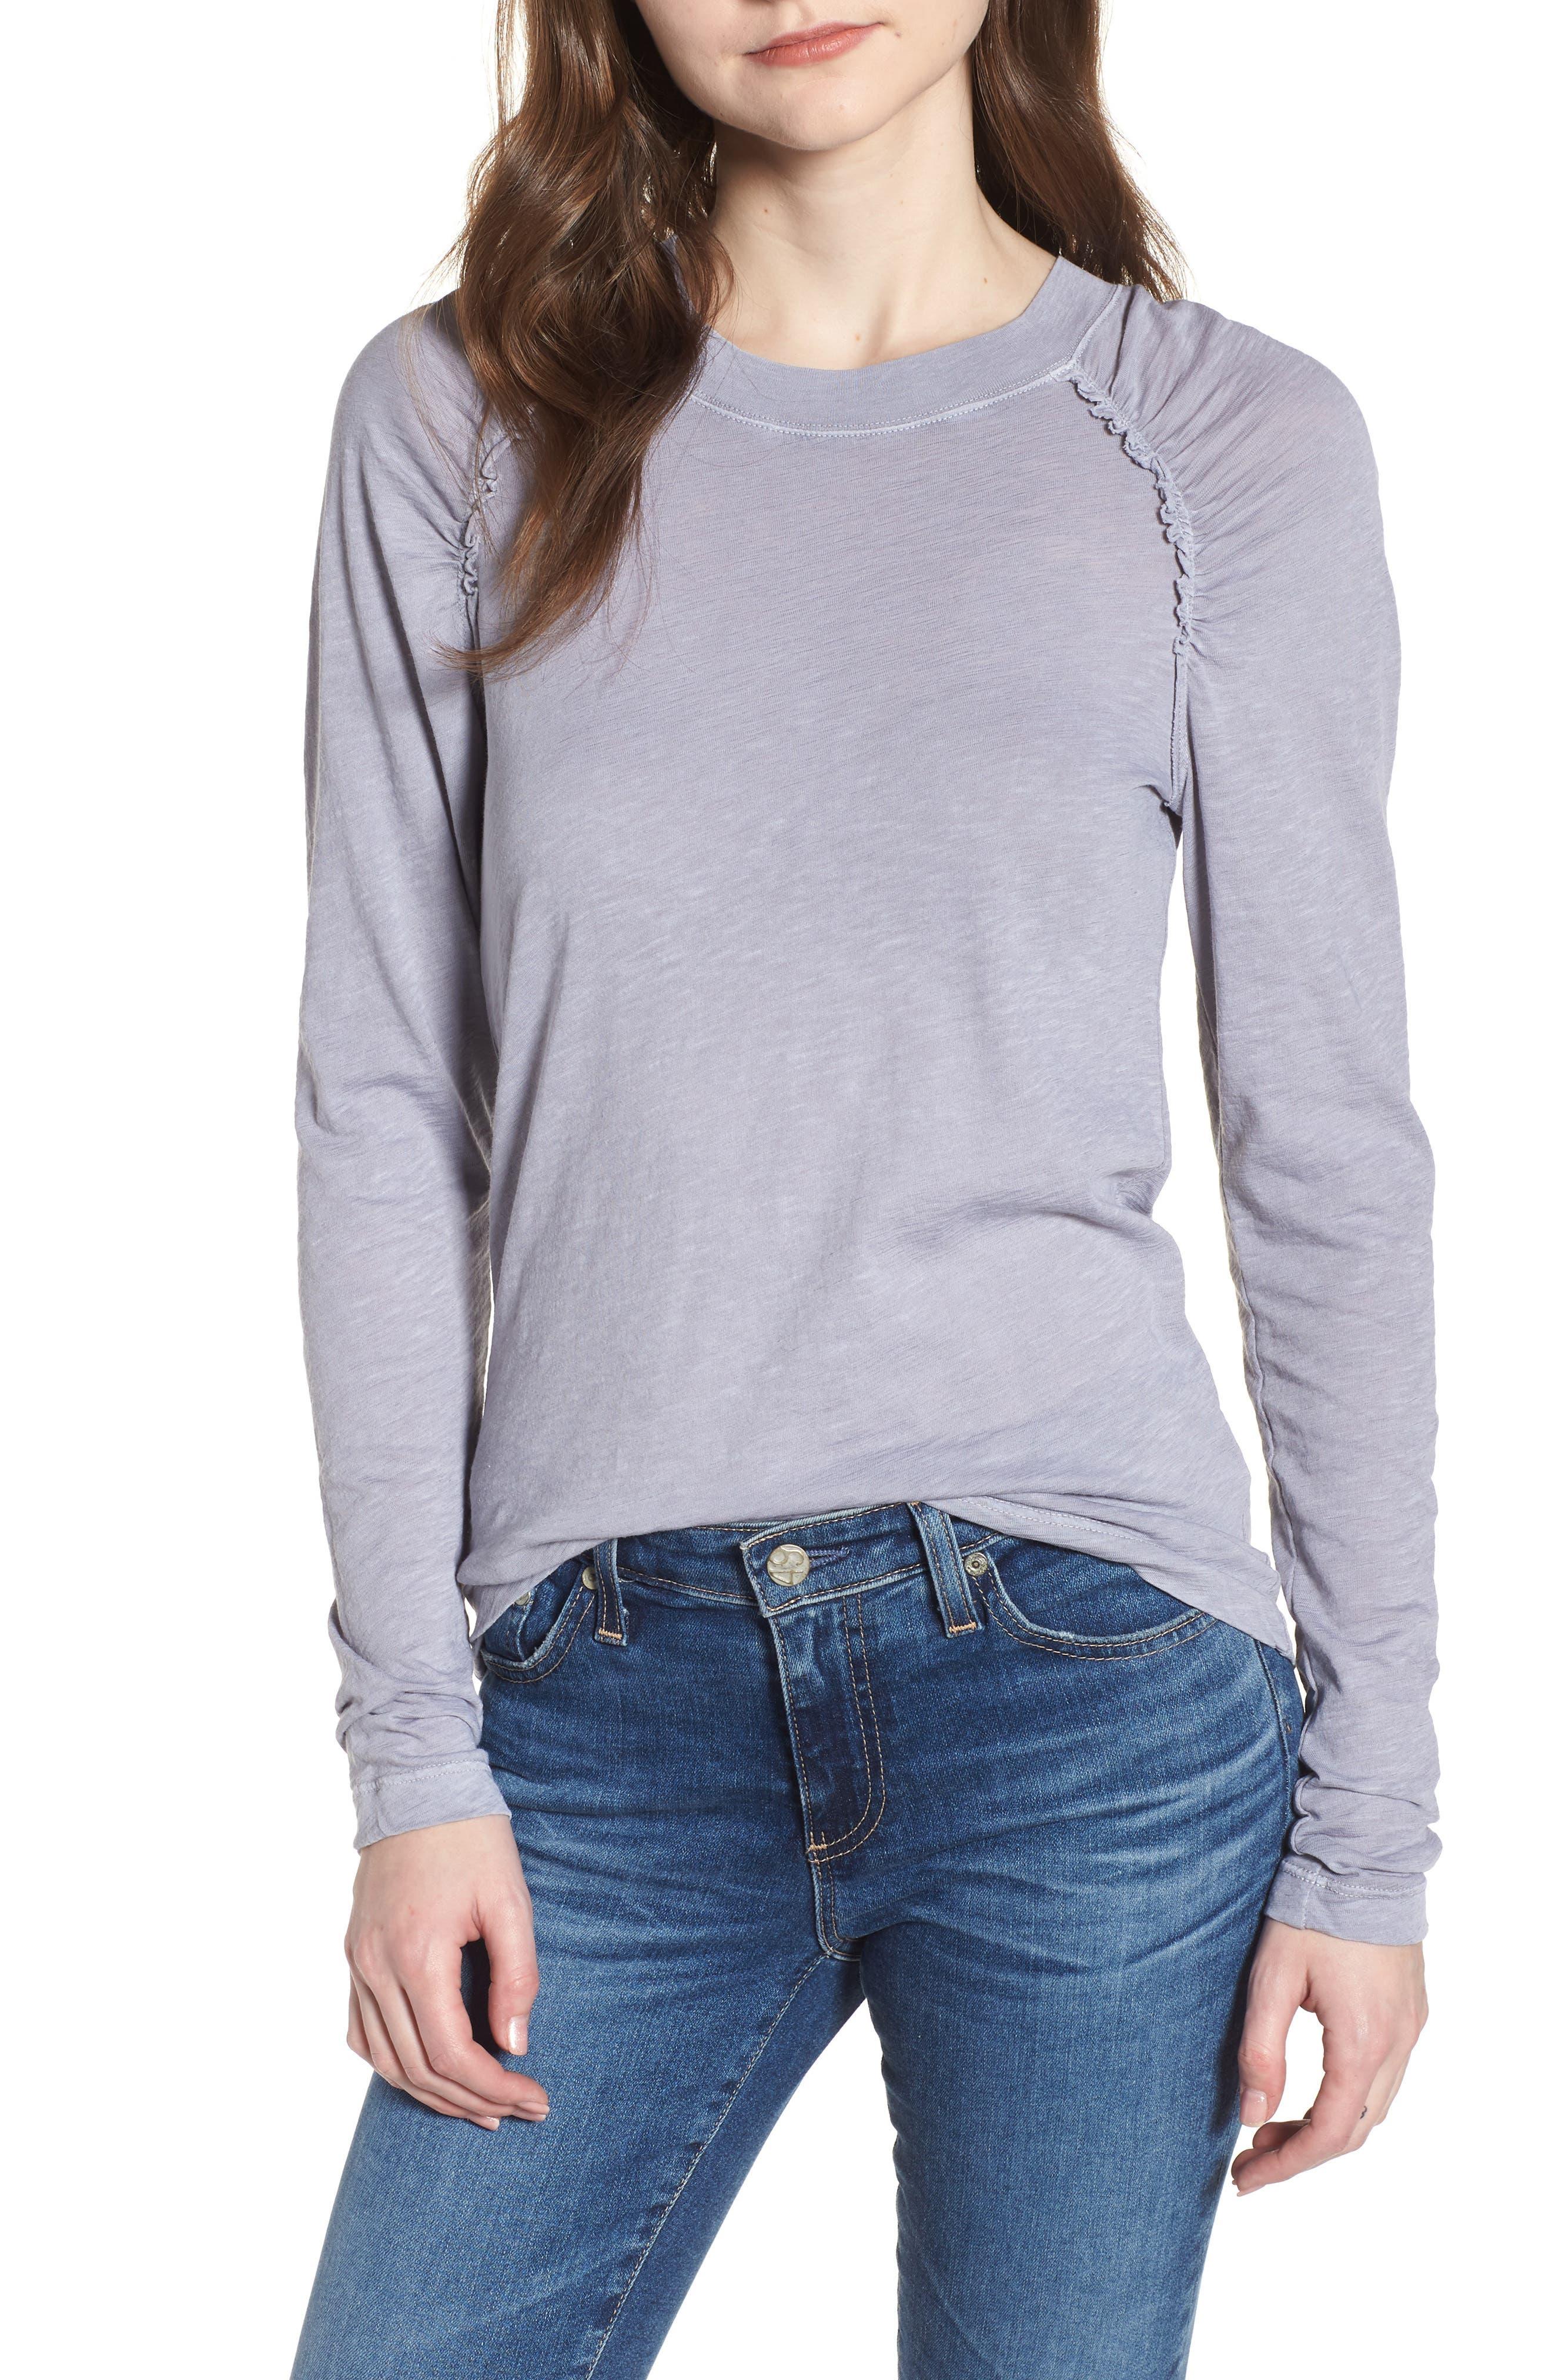 Womens Clara Longsleeve T-Shirt Brax Free Shipping Clearance Store Free Shipping Ebay Pz1MXO